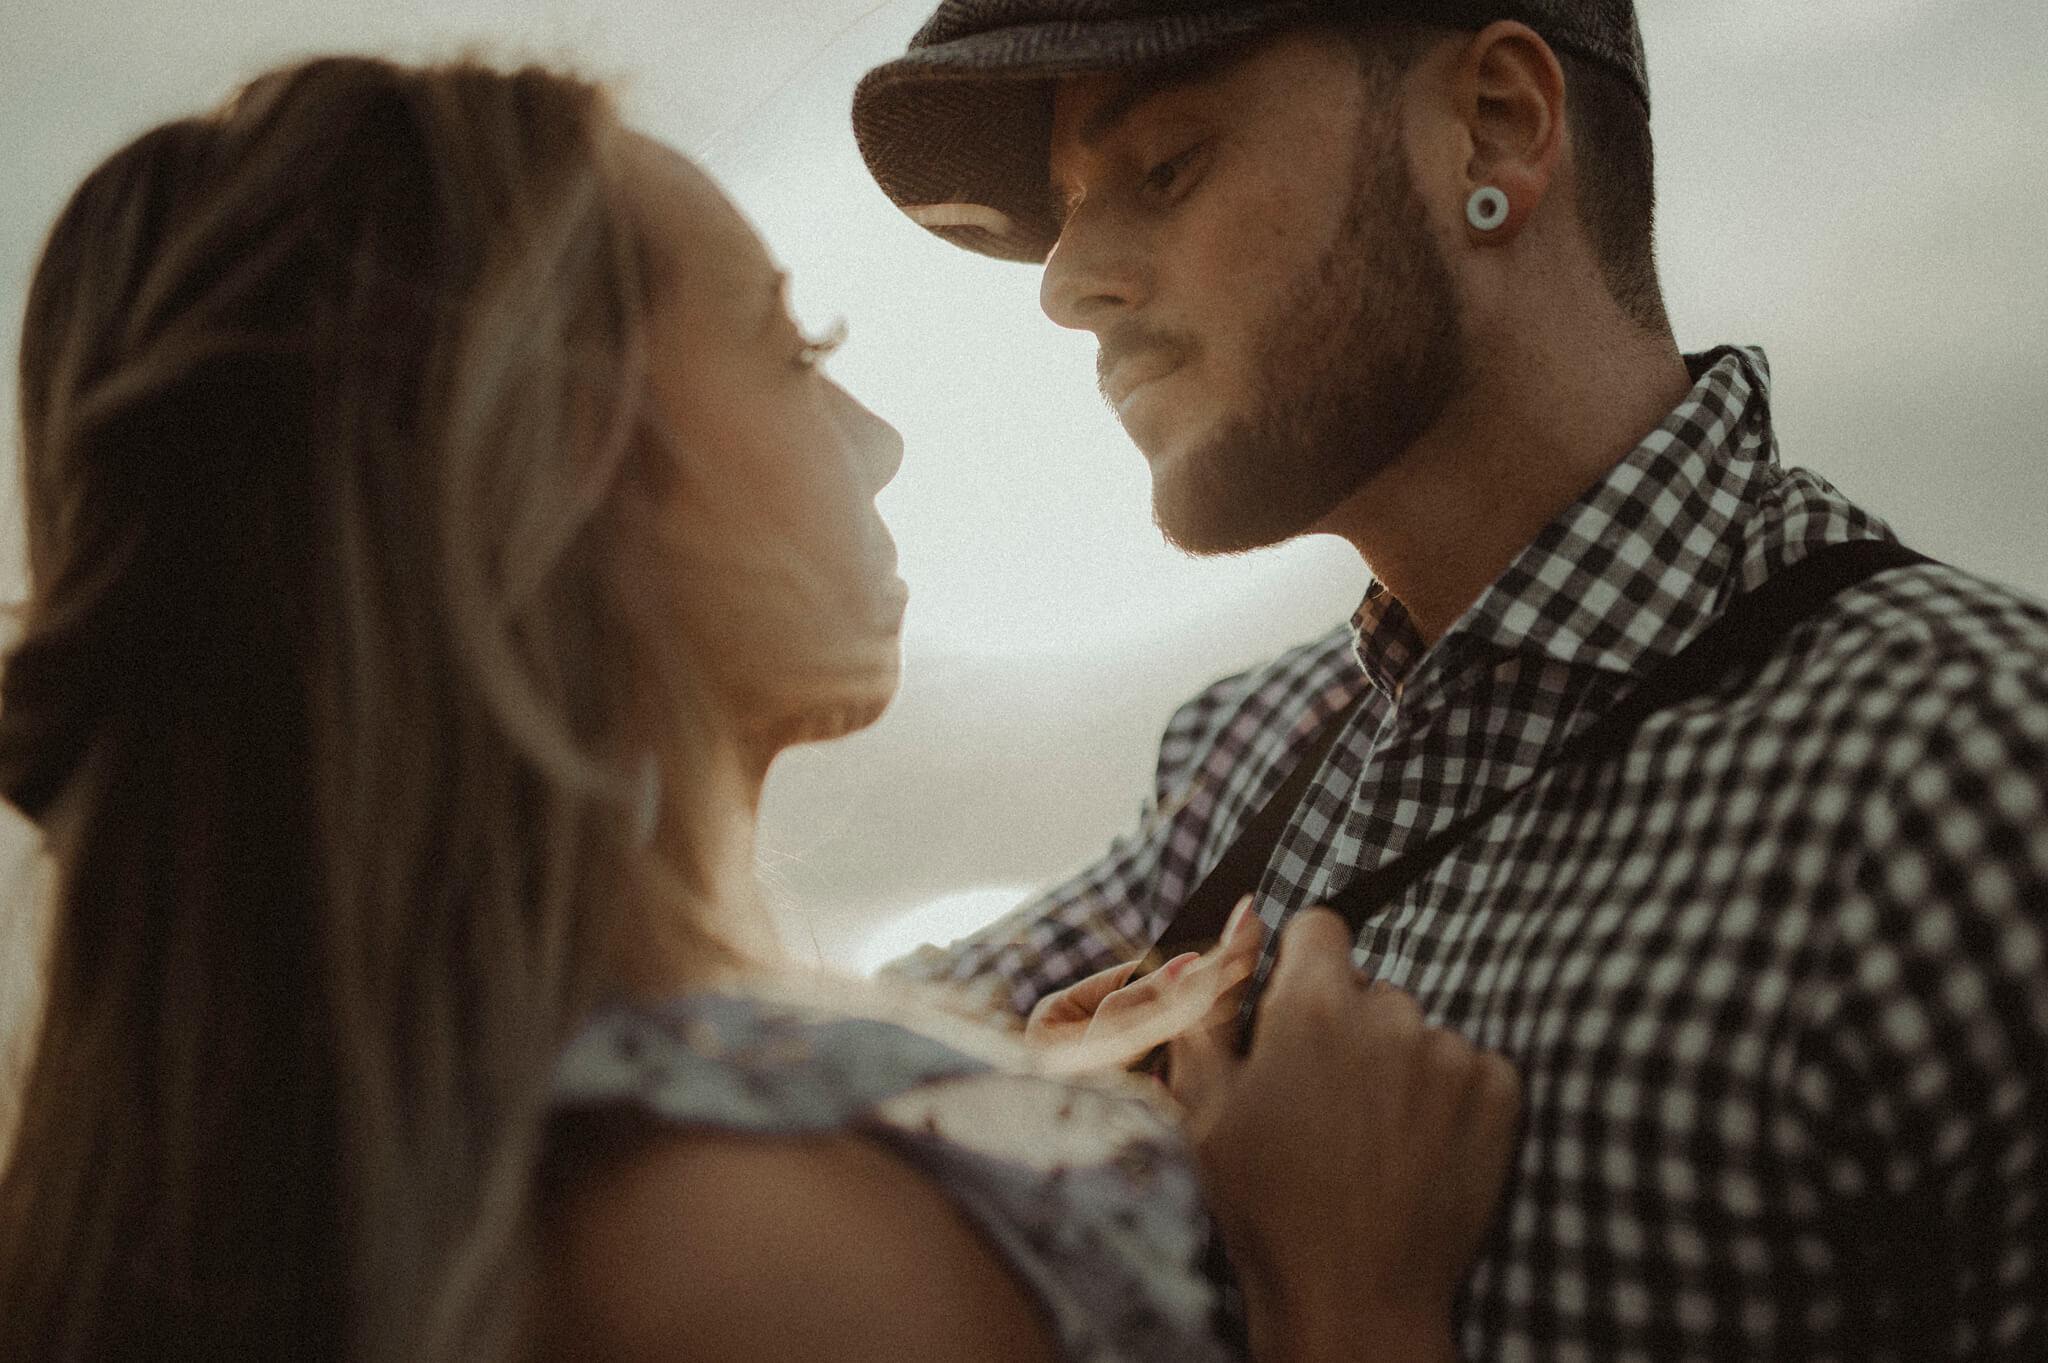 wedding-photographer-and-videographer-Southerndown-Bridgend-UK-02